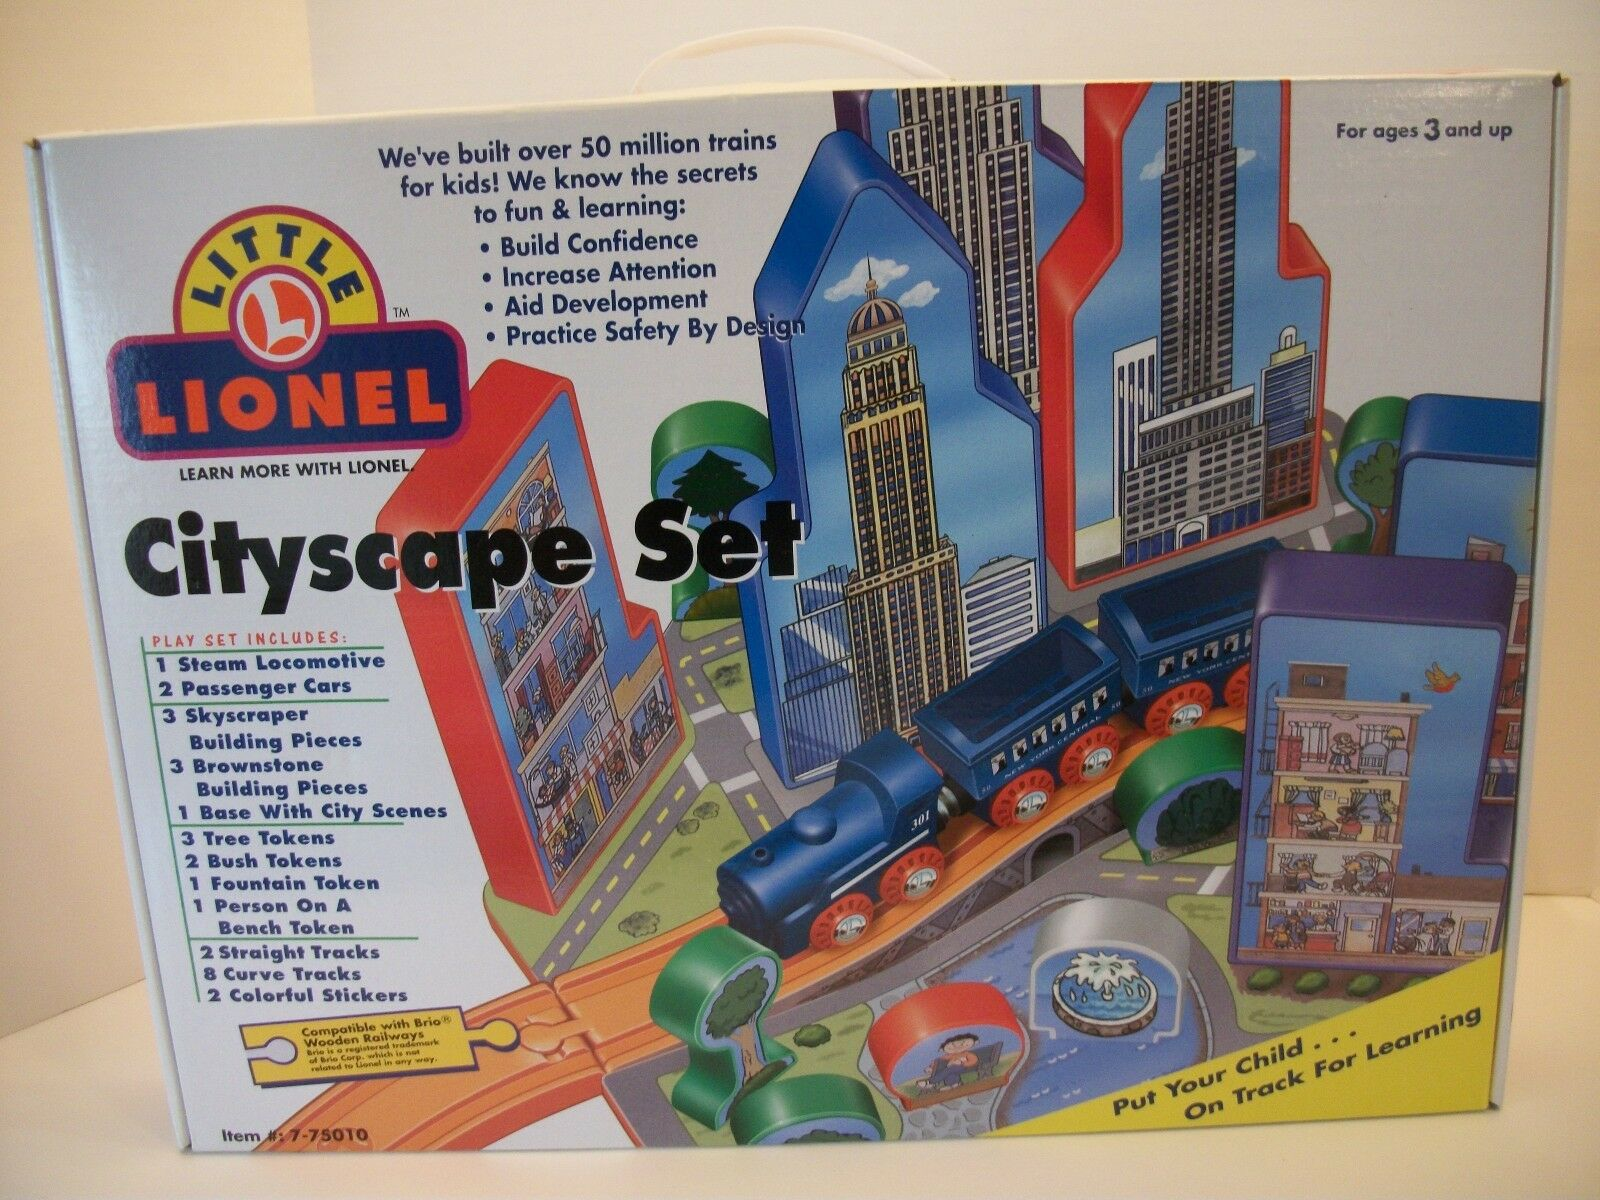 Preschool Toys kids Train set Little Lionel Cityscape Cityscape Cityscape set compatable with brio 31e518